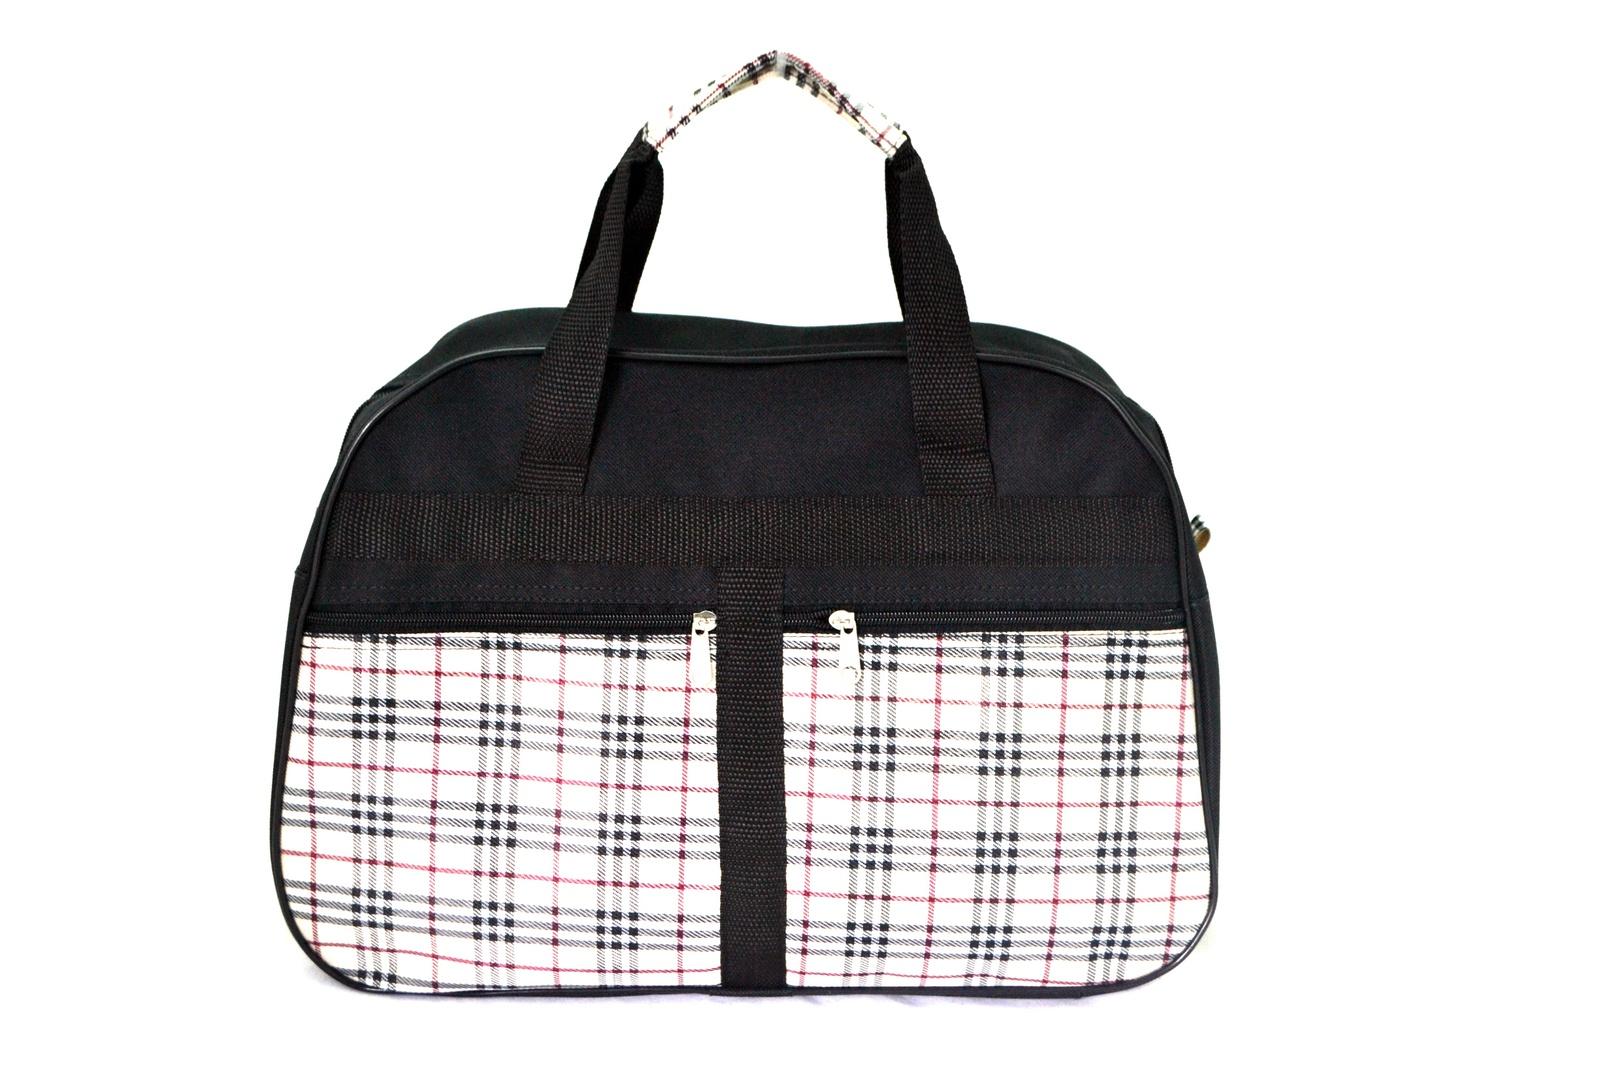 Сумка хозяйственная BINOM сумка хозяйственная shopping bag цвет голубой